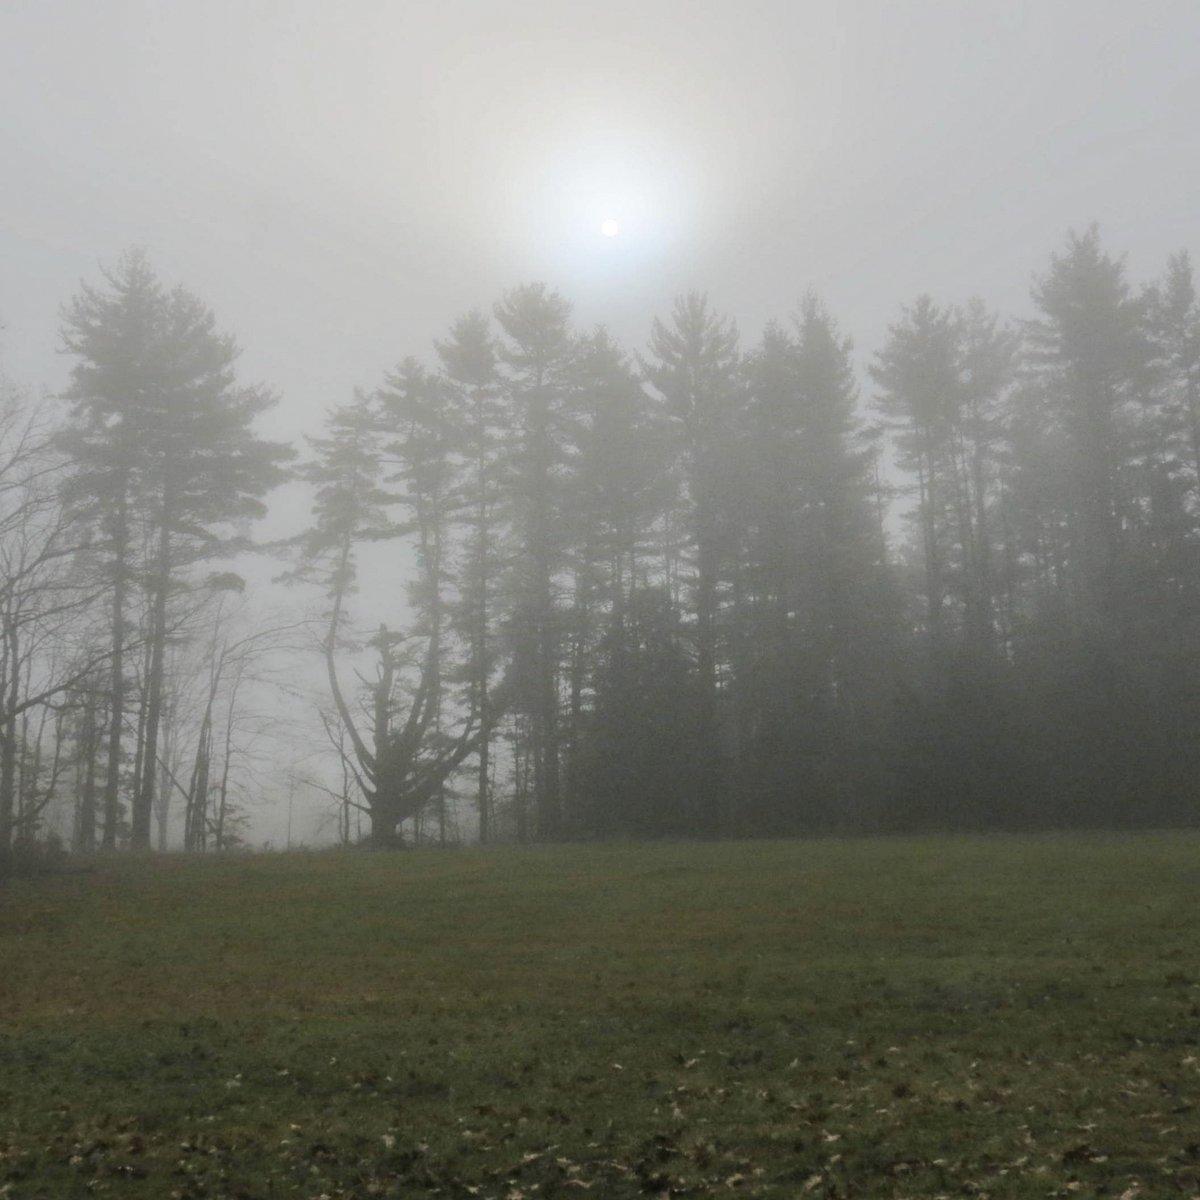 4. Foggy View